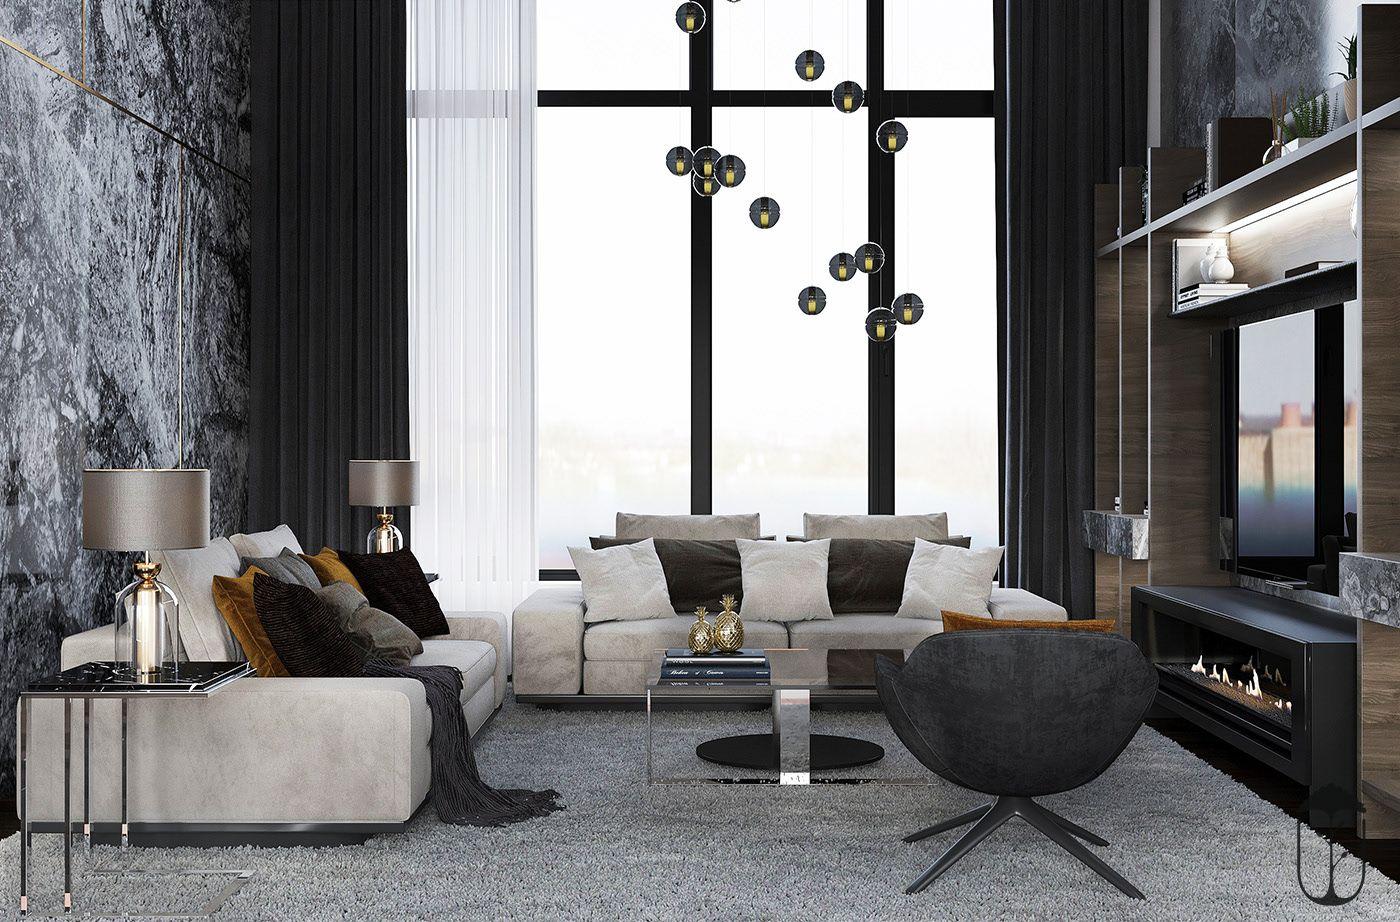 Ui041 On Behance Interior Design Home Decor Interior